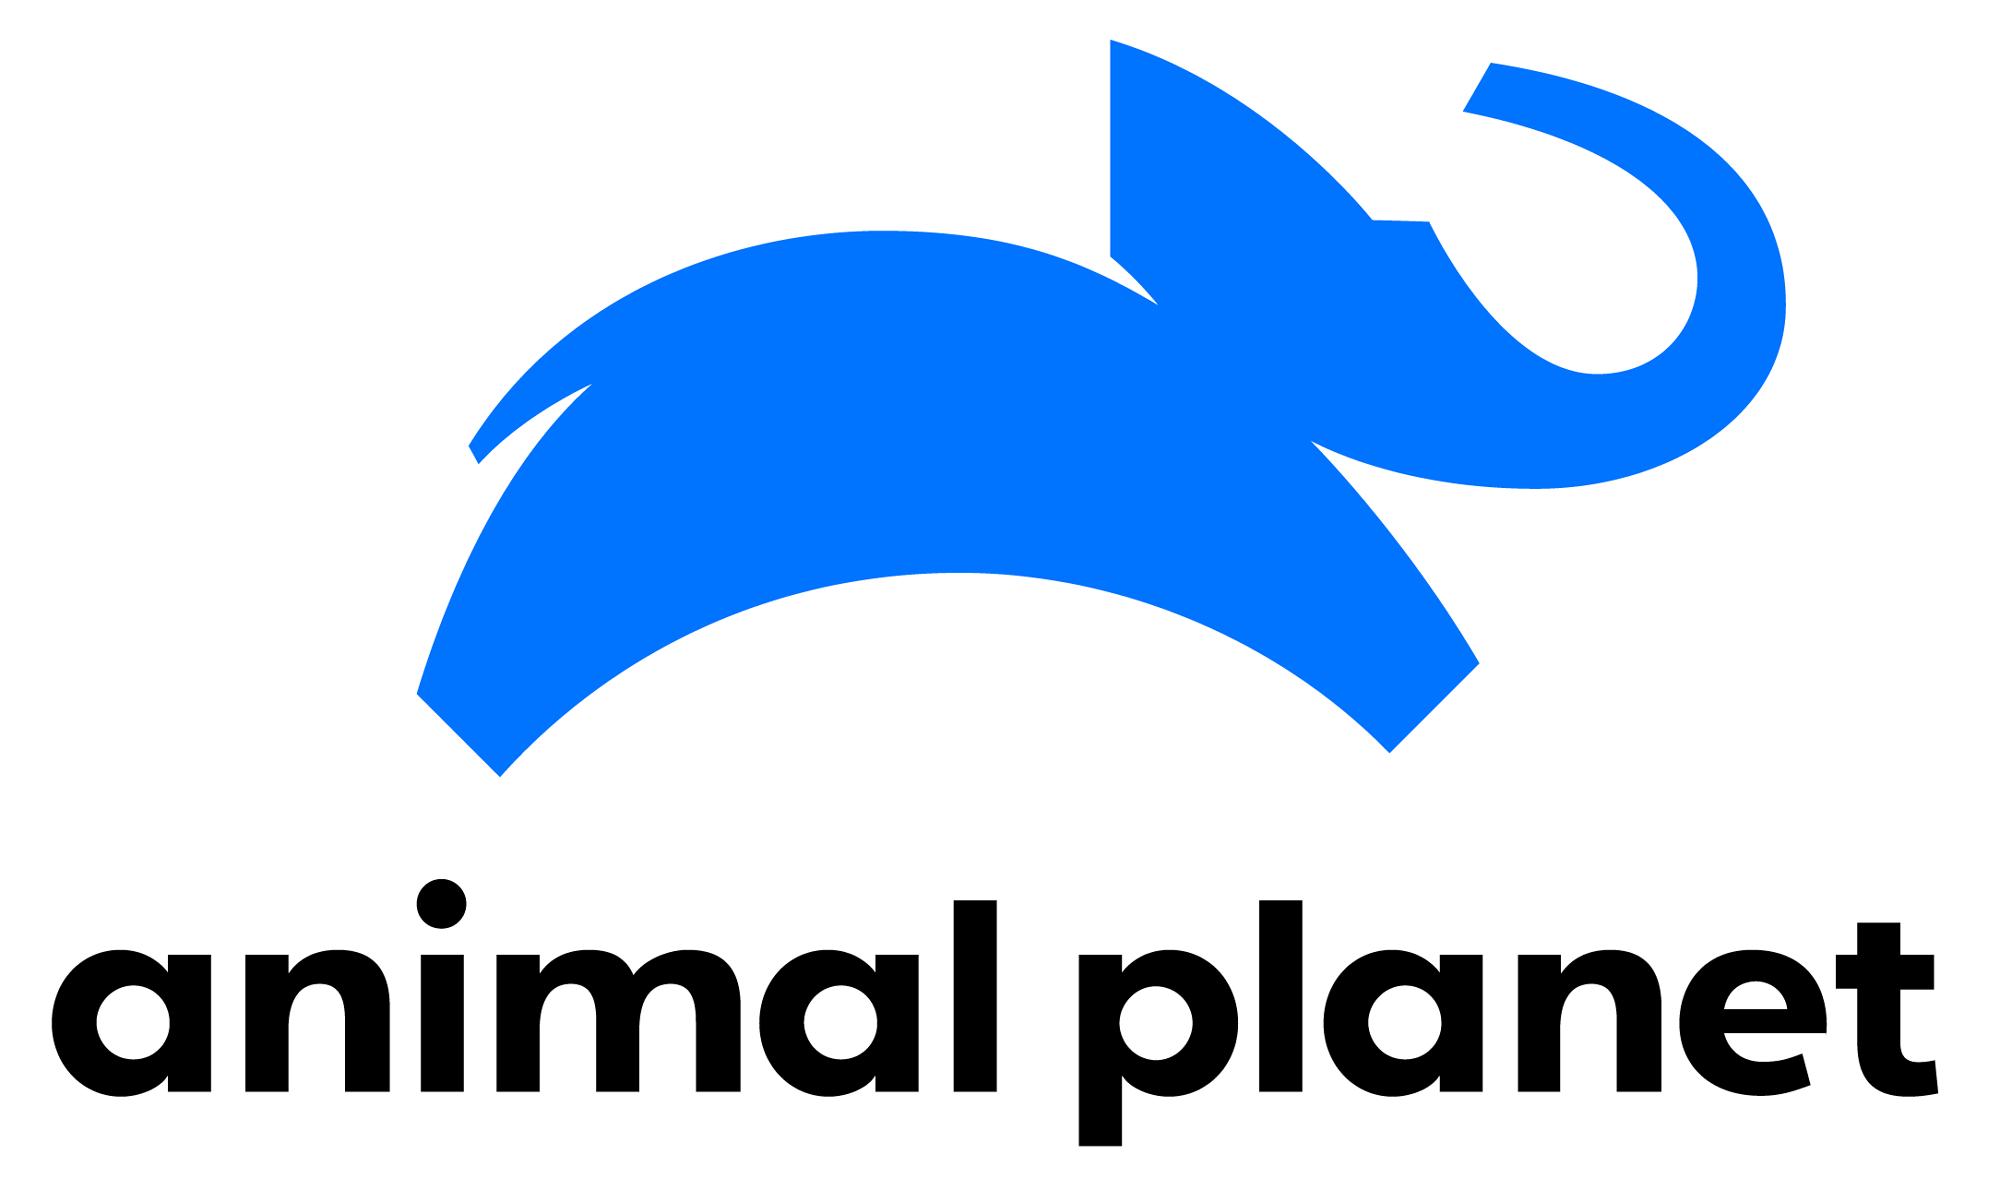 New Logo for Animal Planet by Chermayeff & Geismar & Haviv